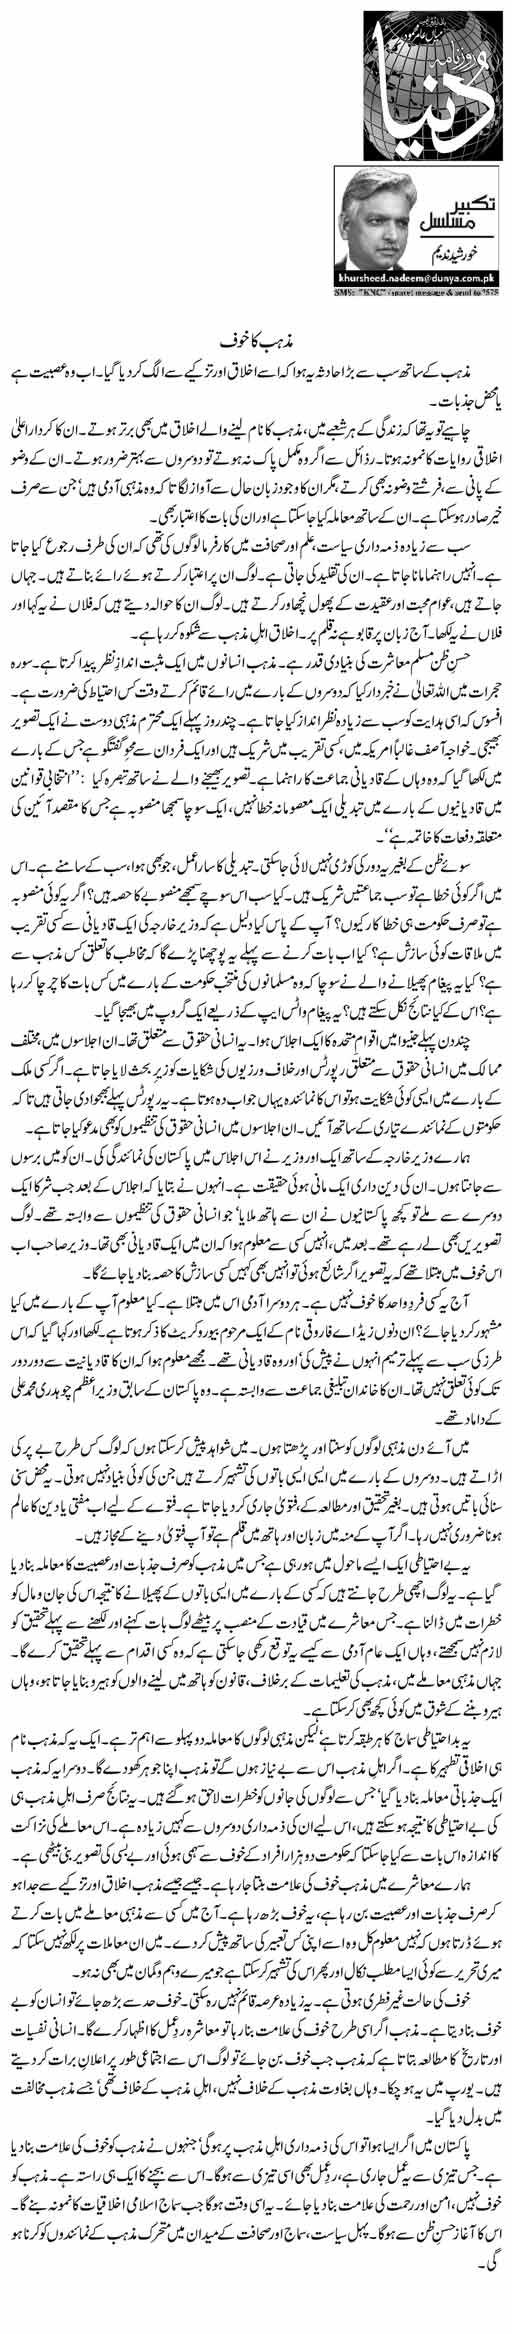 Mazhab Ka Khauf | Khursheed Nadeem | Daily Urdu Columns